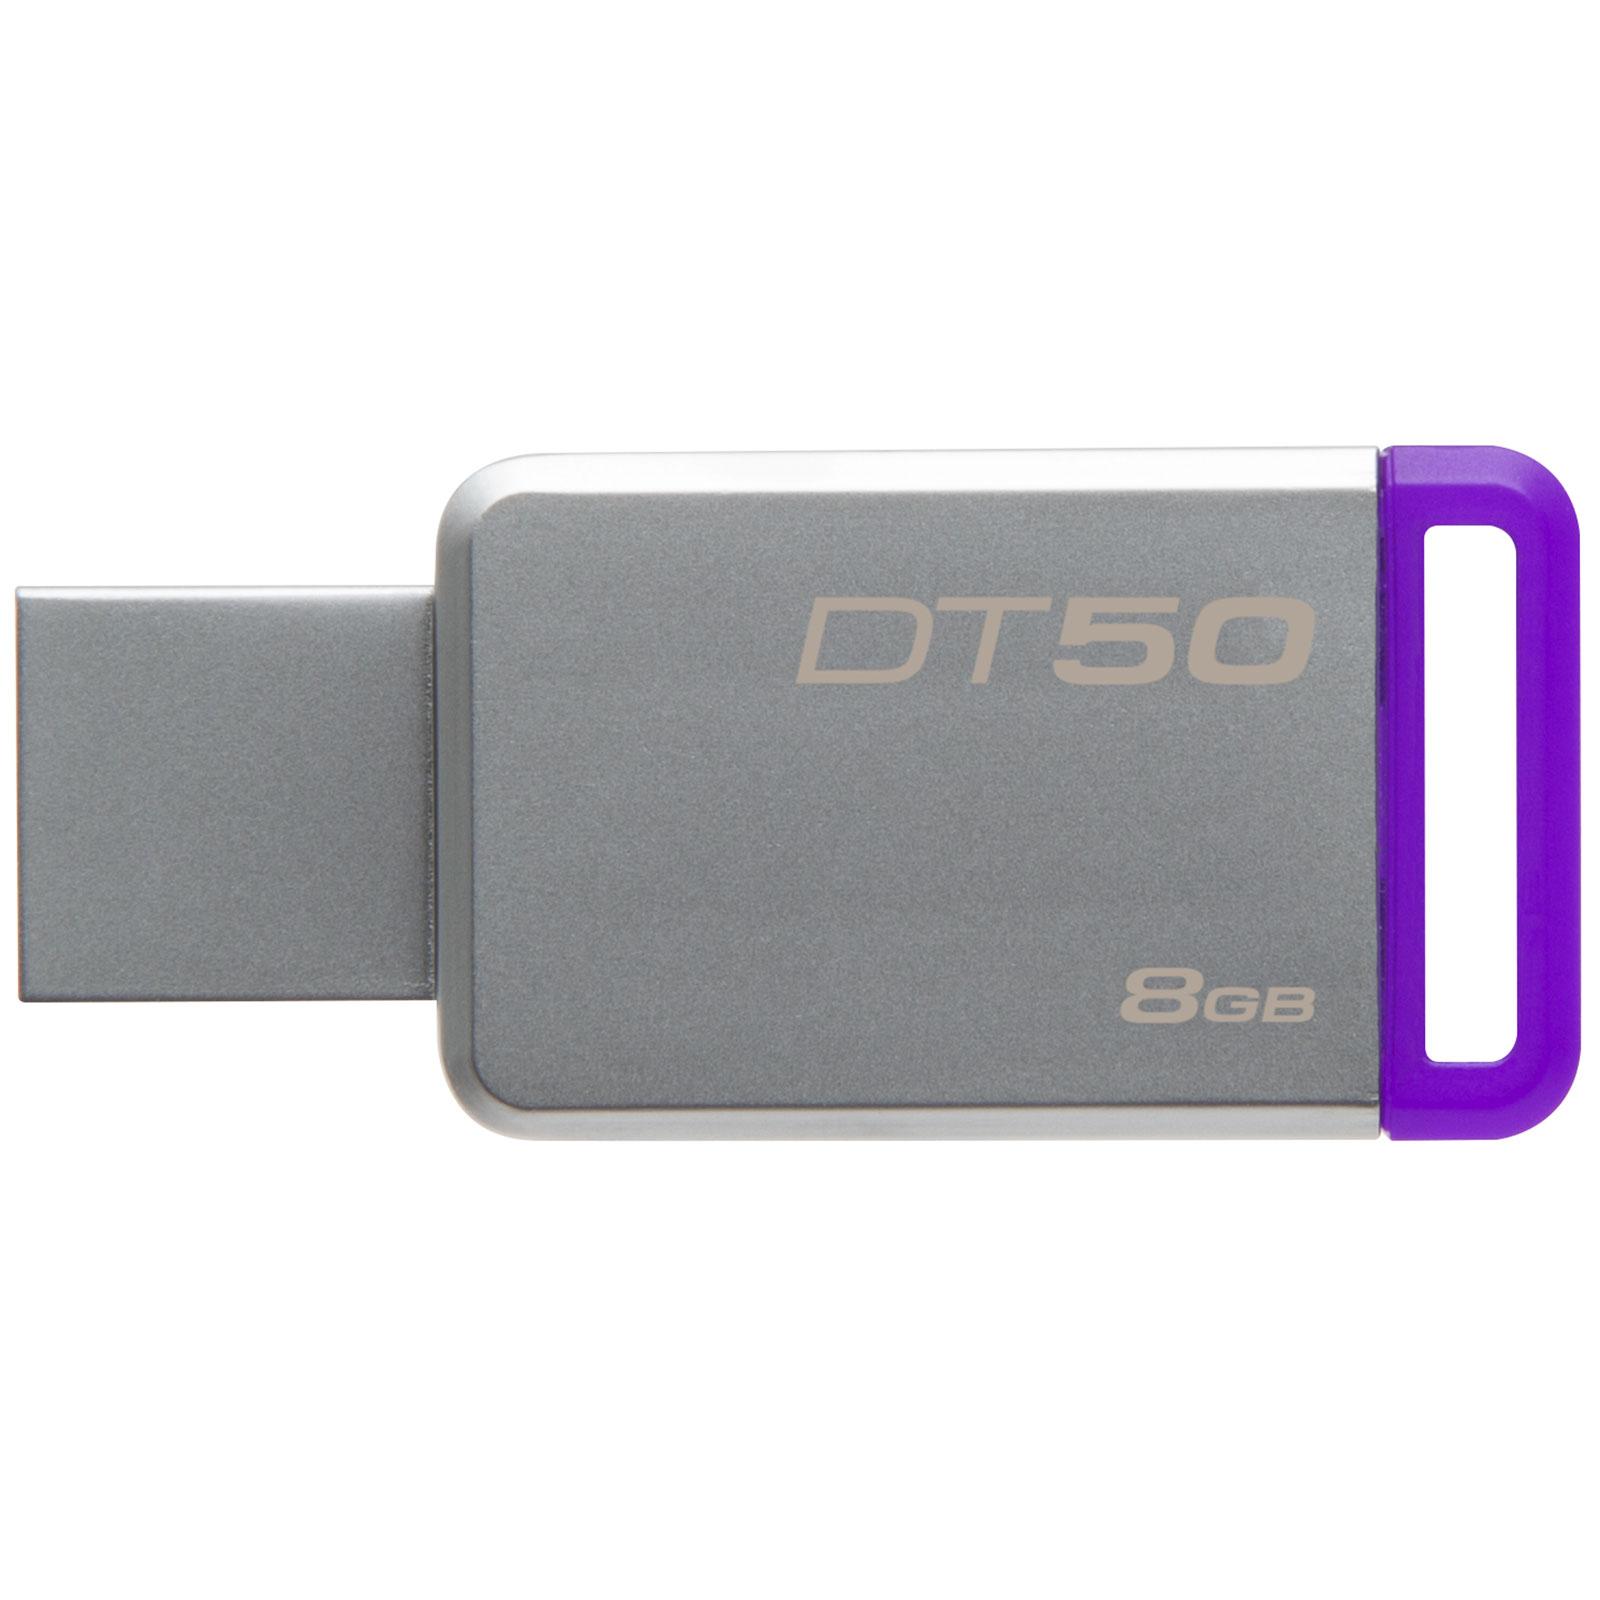 Kingston DataTraveler 50 8Go USB 3.1 (DT50/8GB) - Achat / Vente Clé USB sur Cybertek.fr - 1